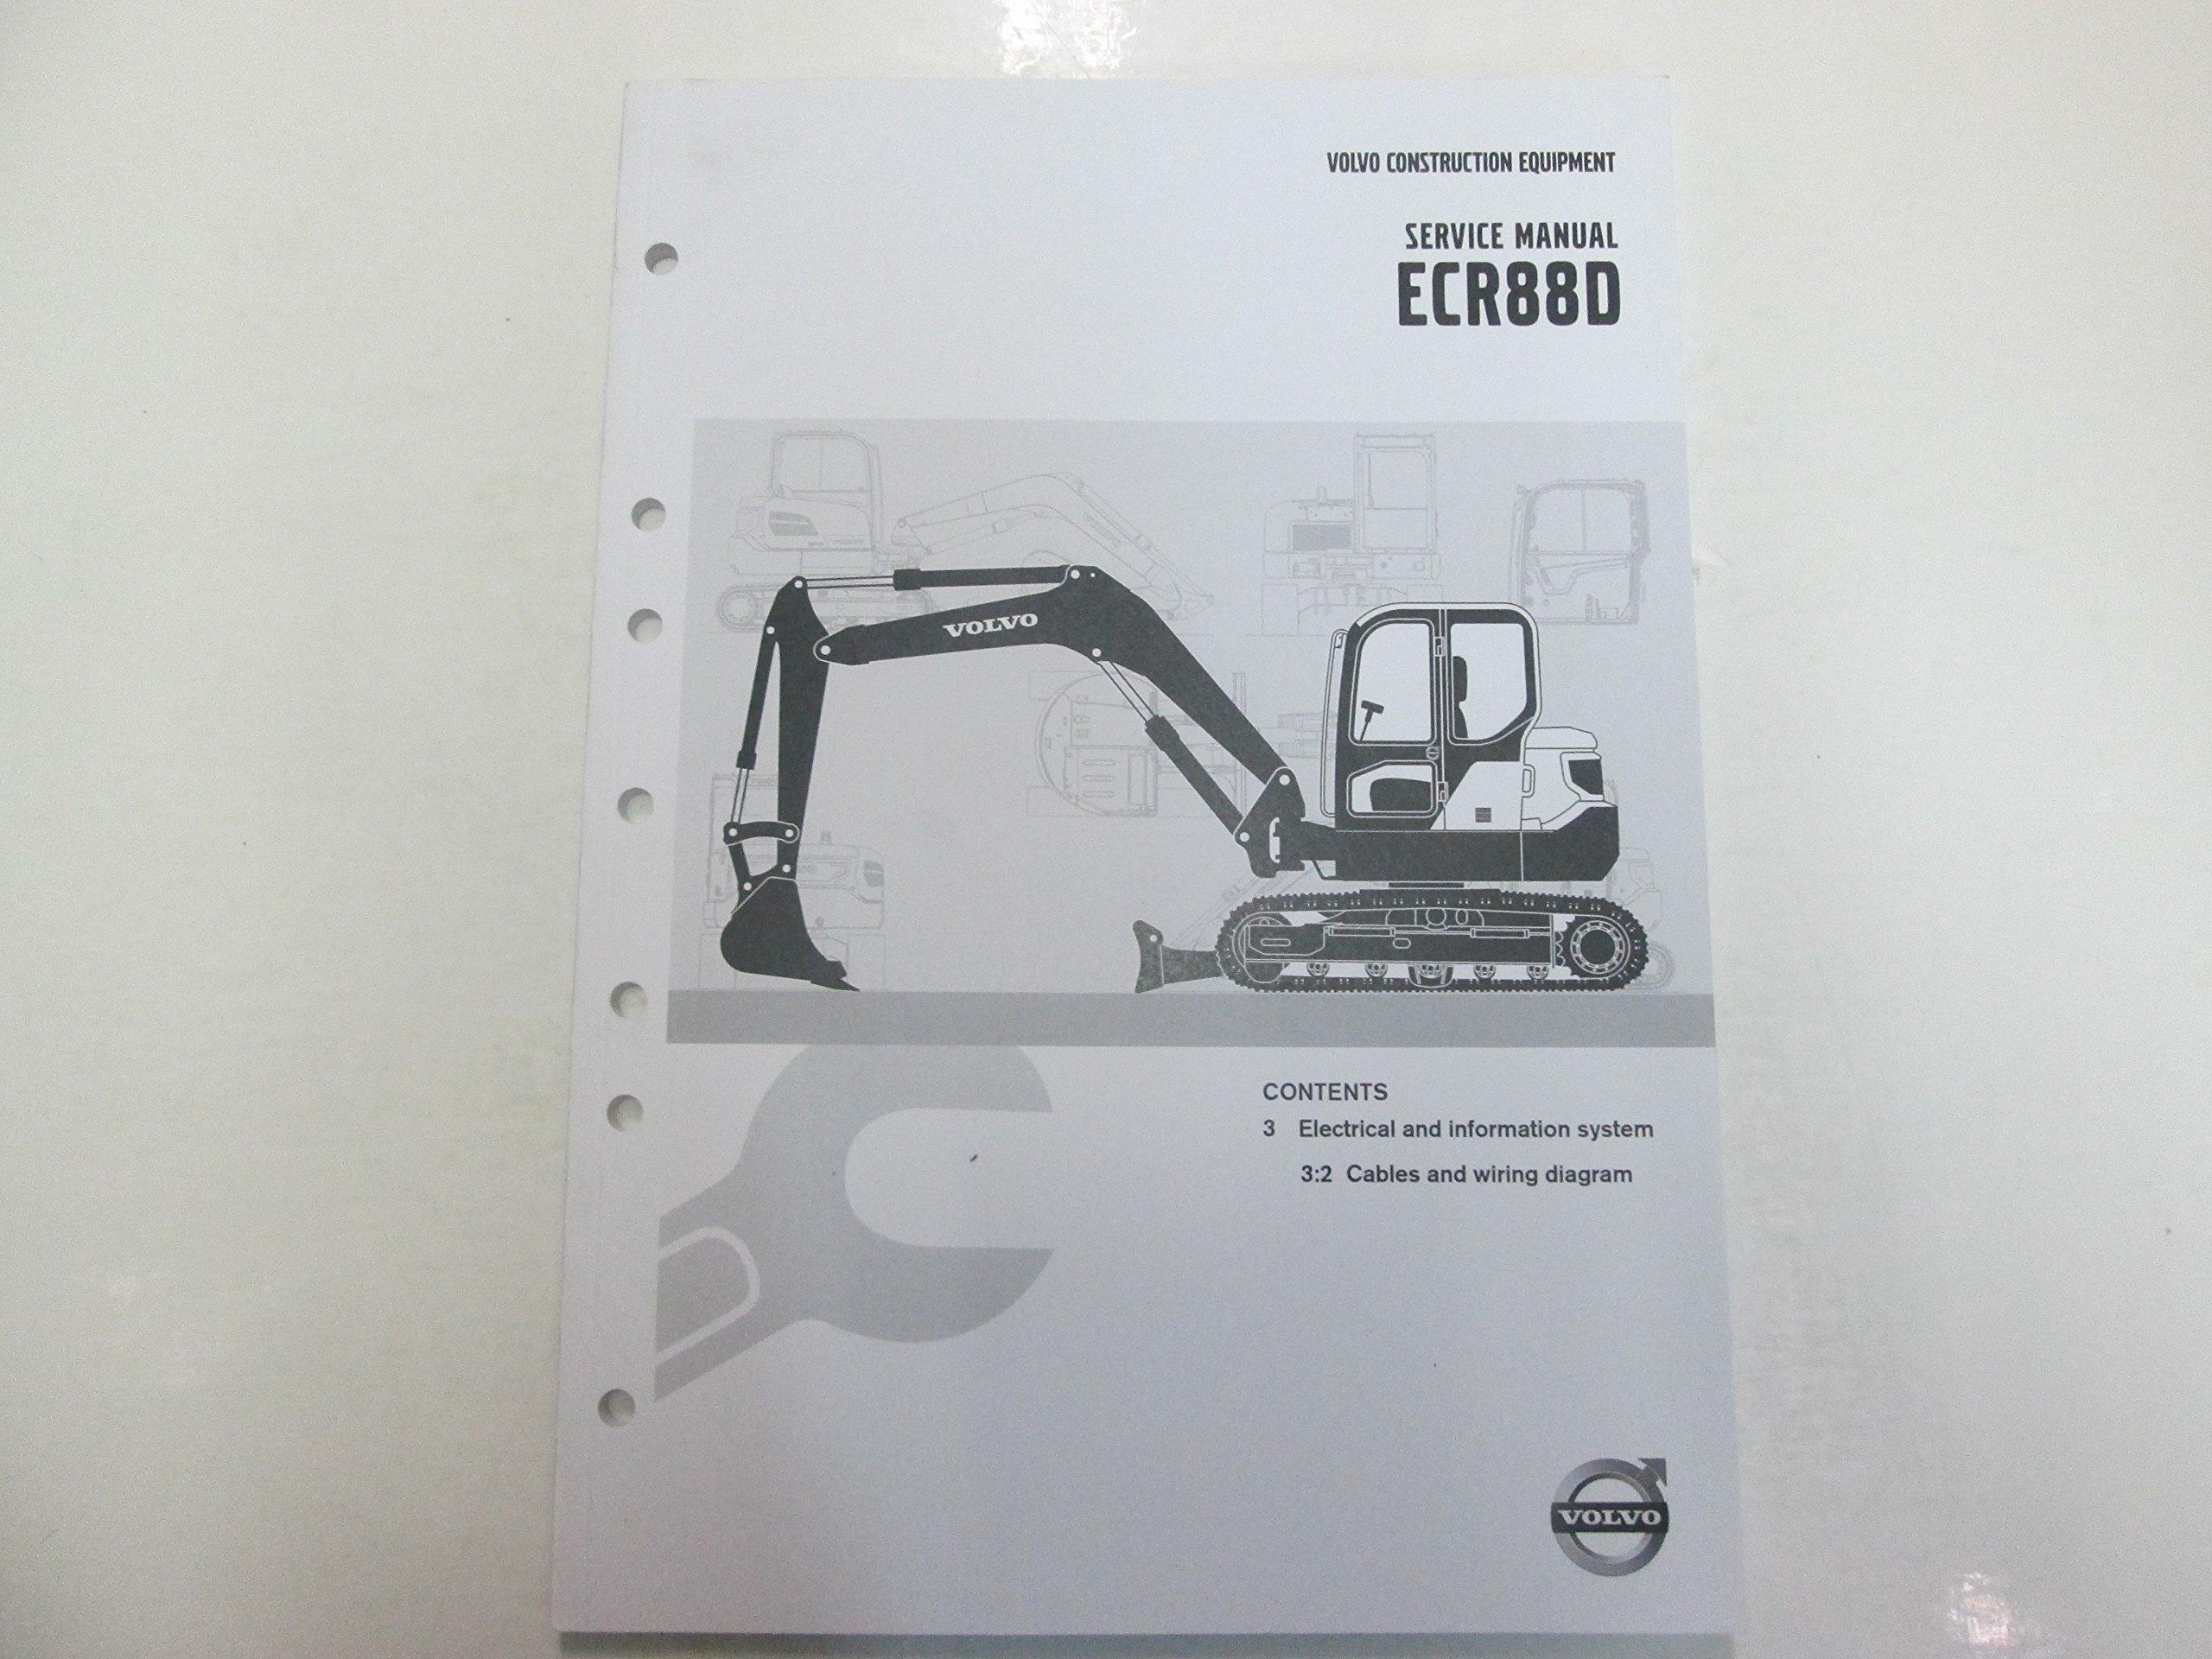 Seat Wiring Diagram Complete Car Engine Scheme And Wiring Diagram